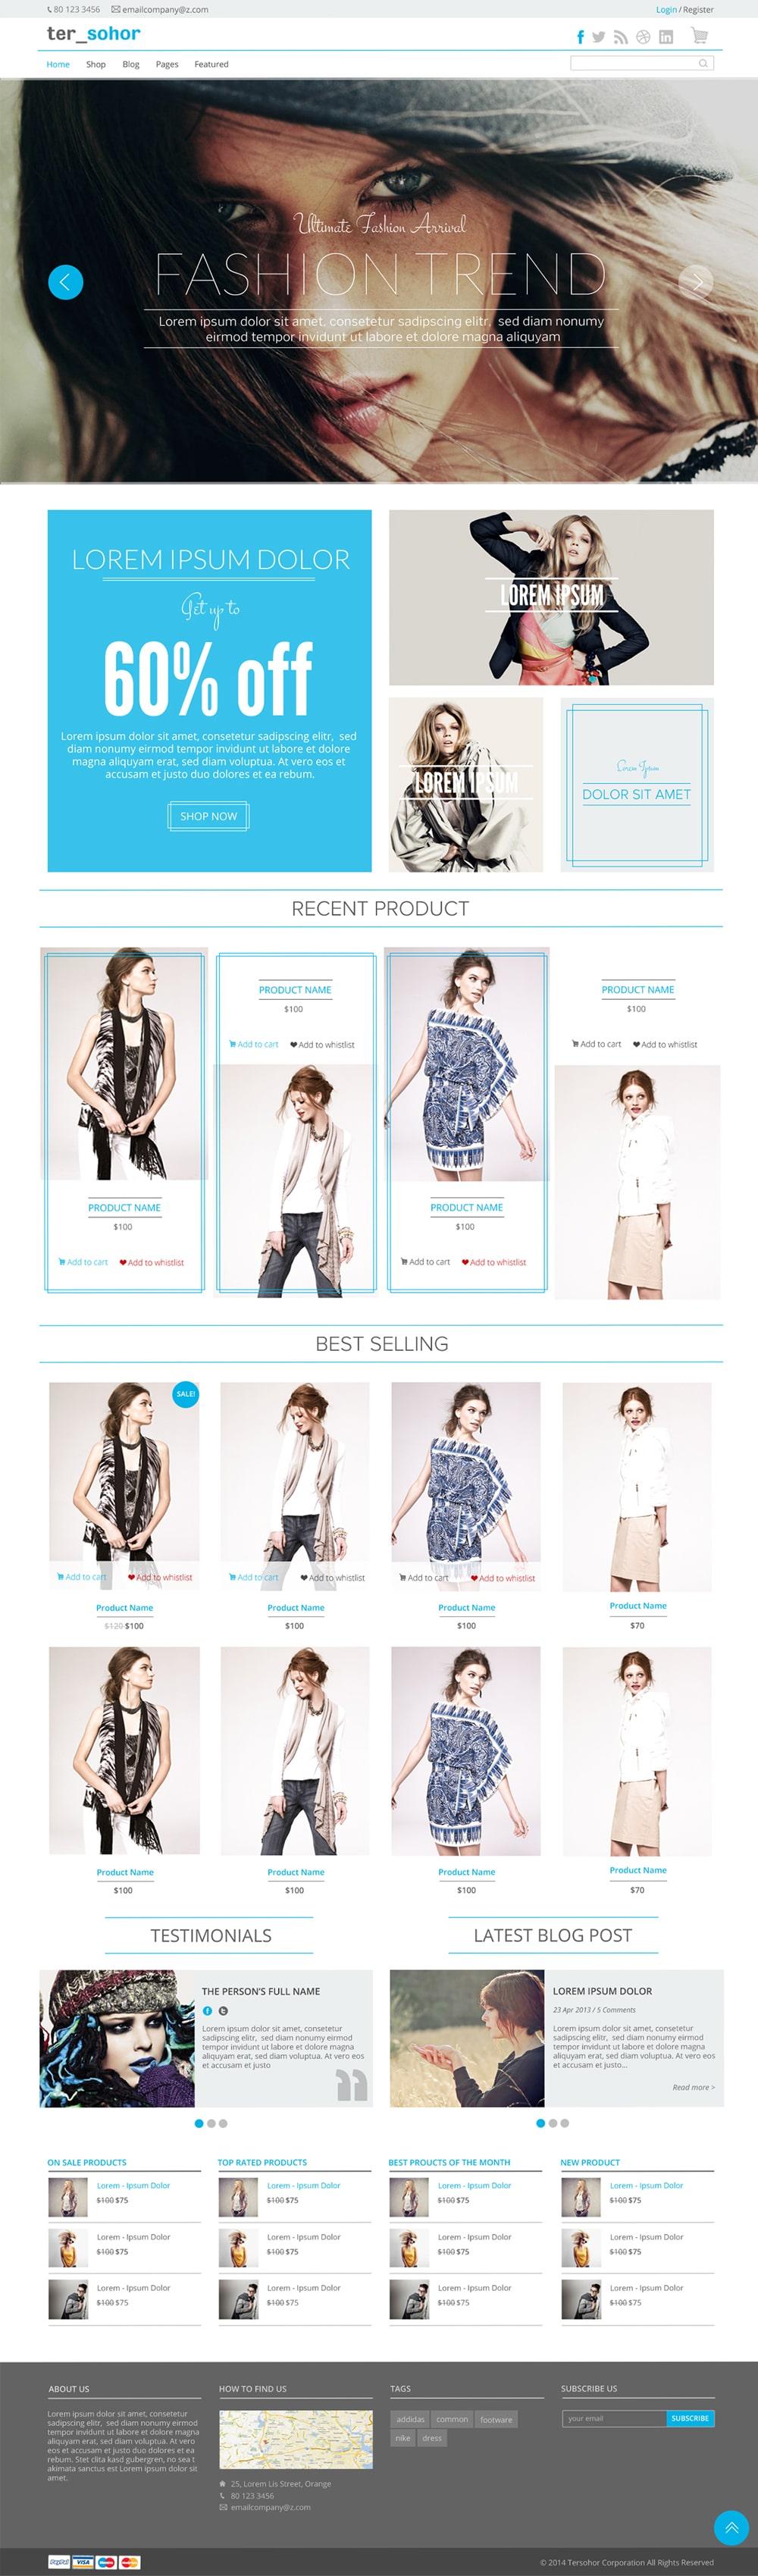 Tersohor - E-commerce Template Free PSD